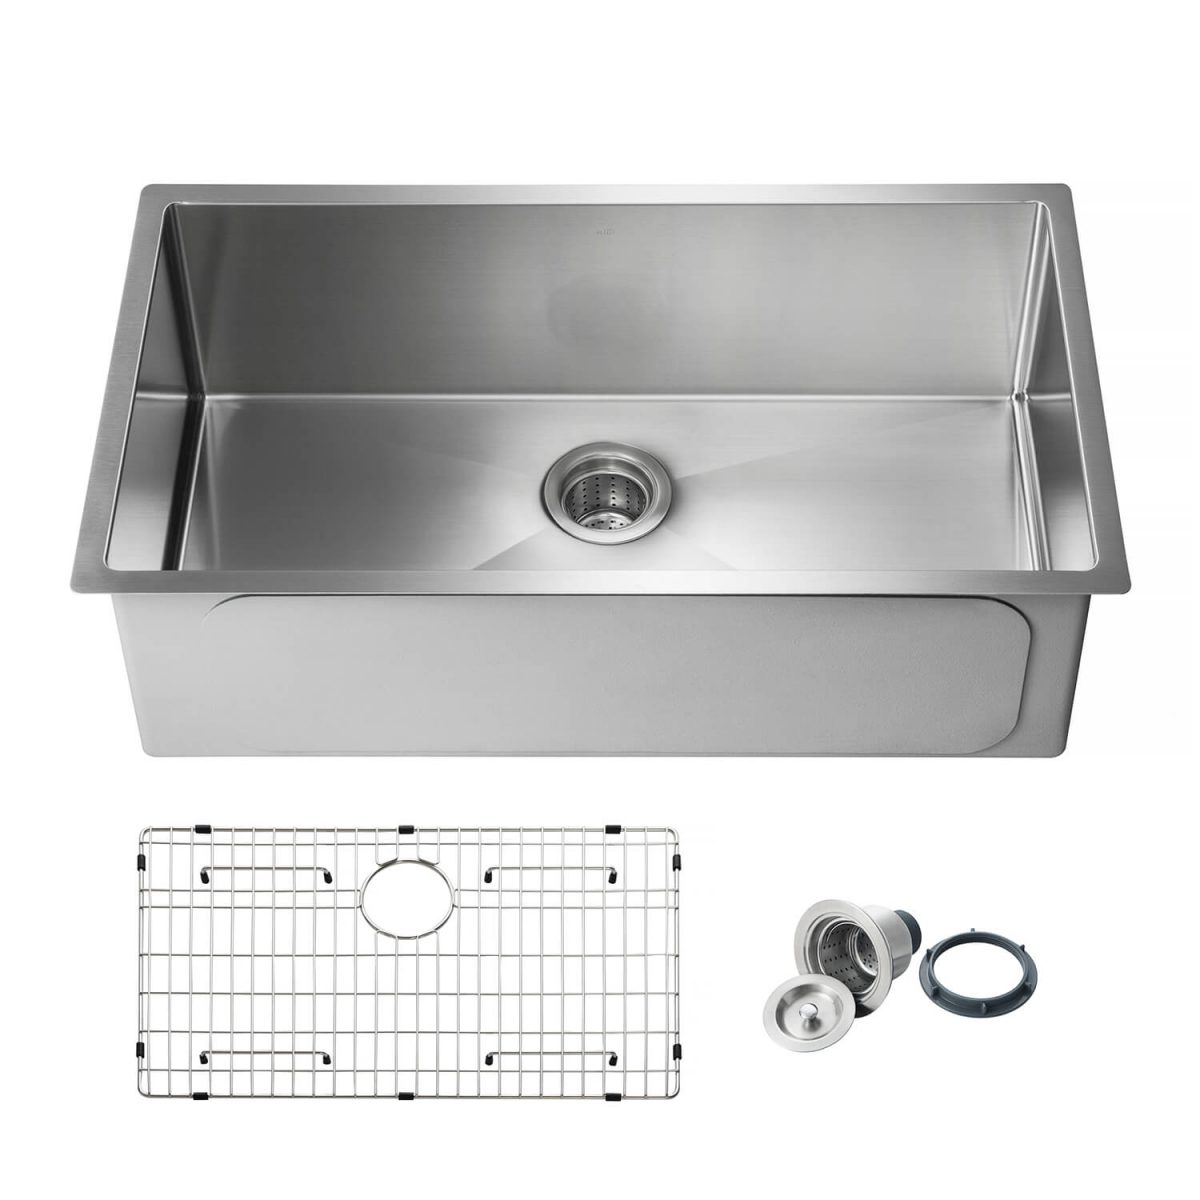 "32 3/4"" Handcrafted Undermount Single Bowl 16 gauge Stainless Steel Kitchen Sink - K1-S33"